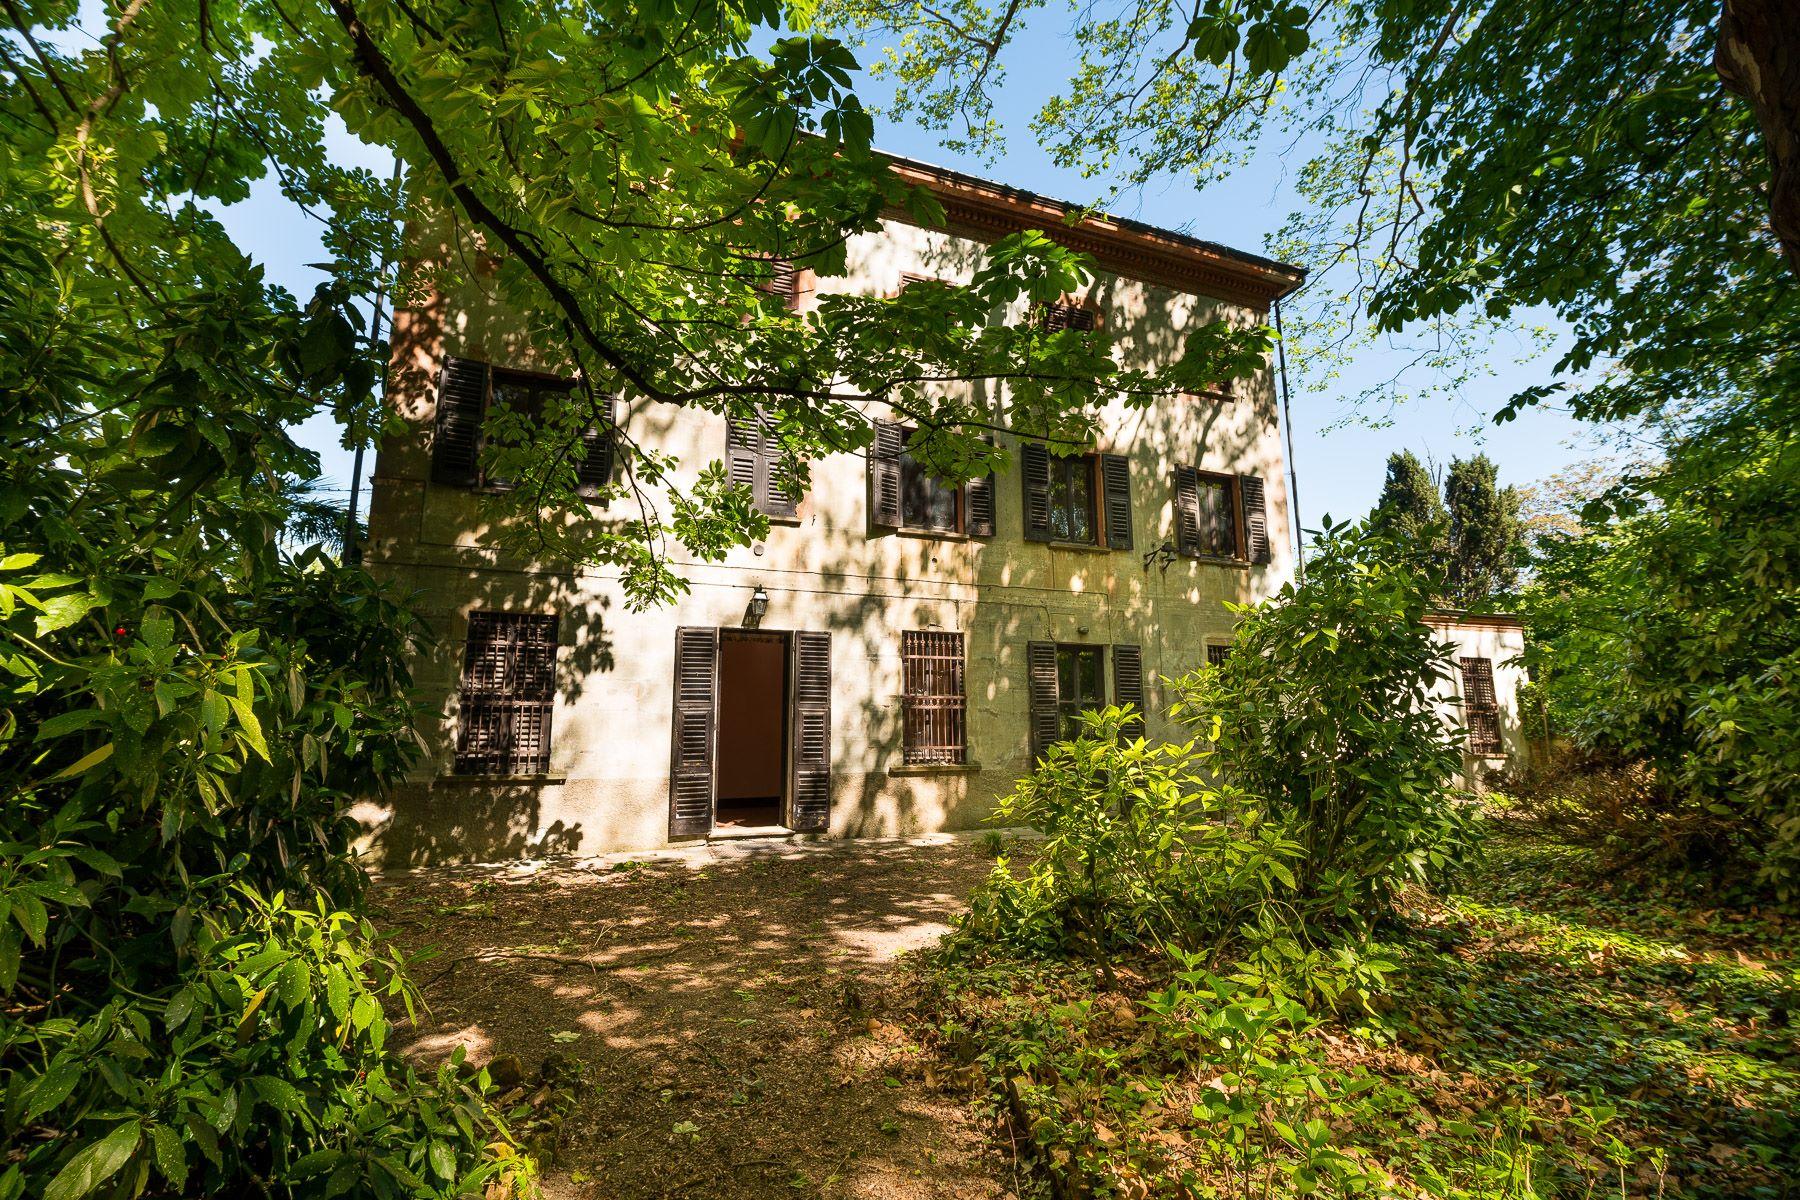 Single Family Home for Sale at Enchanting patrician villa in Monferrato Via Morella Other Alessandria, Alessandria 15070 Italy